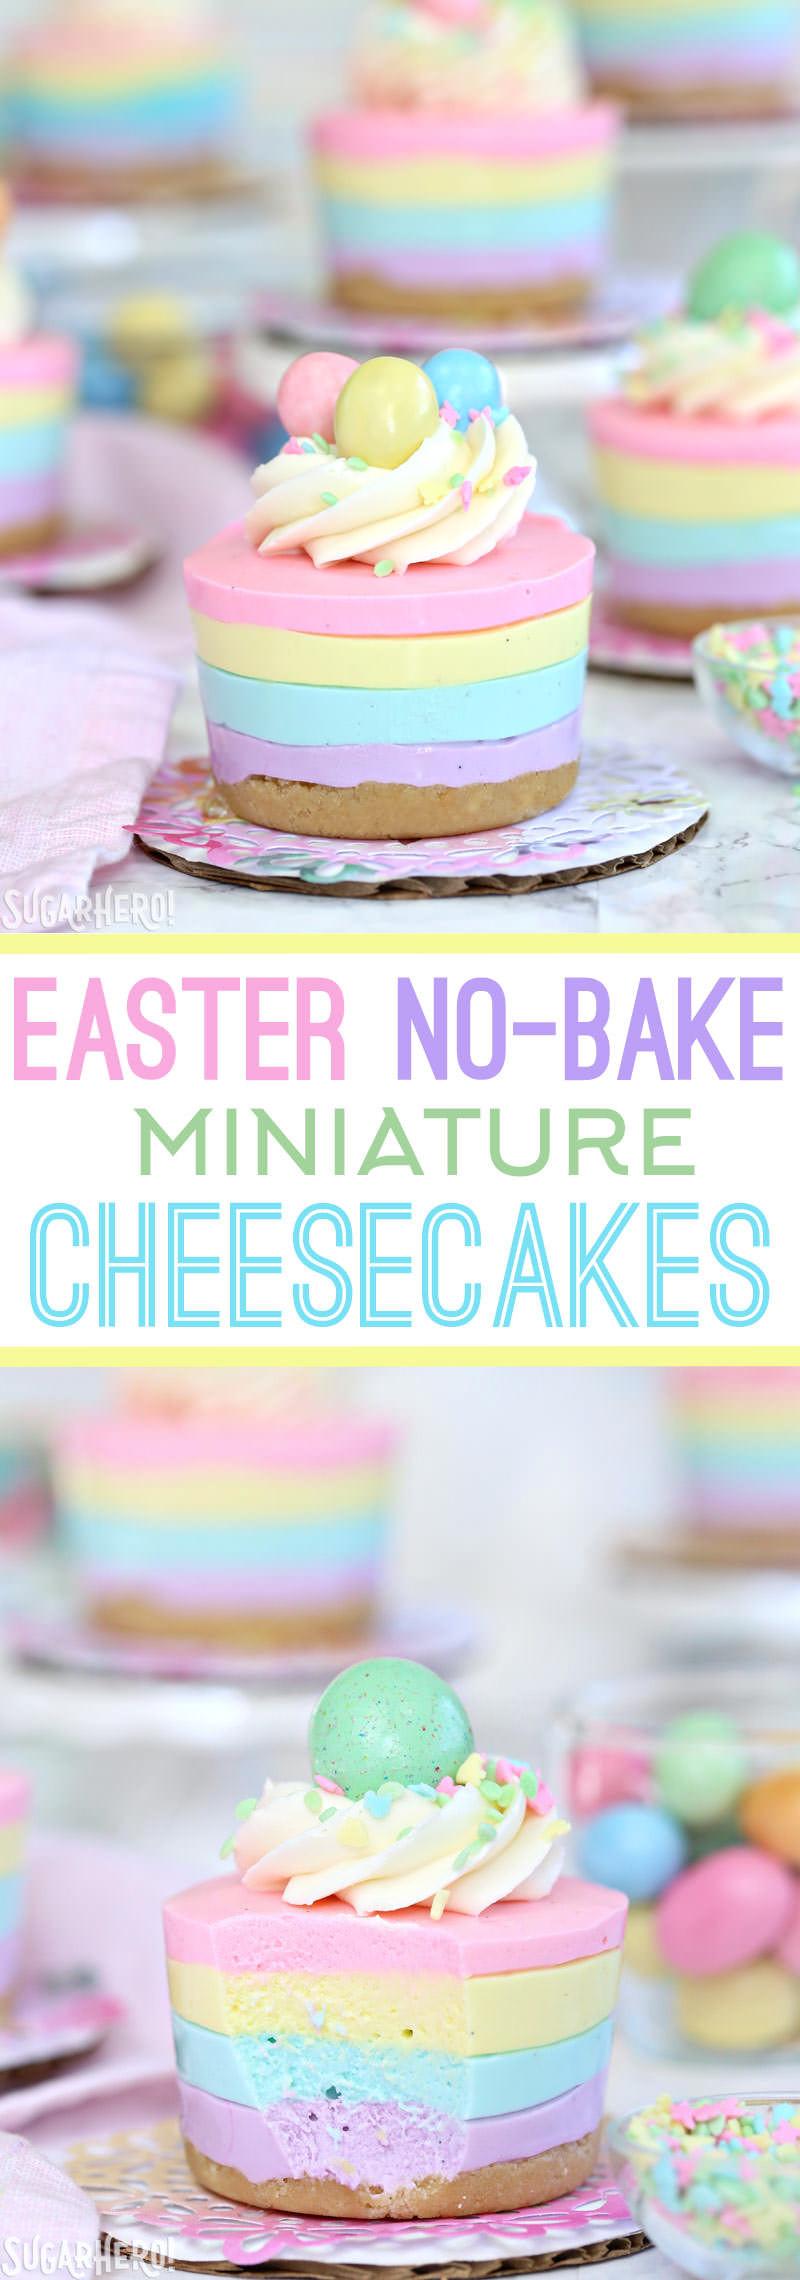 Spring Cheesecake No Bake Easter No Bake Mini Cheesecakes SugarHero